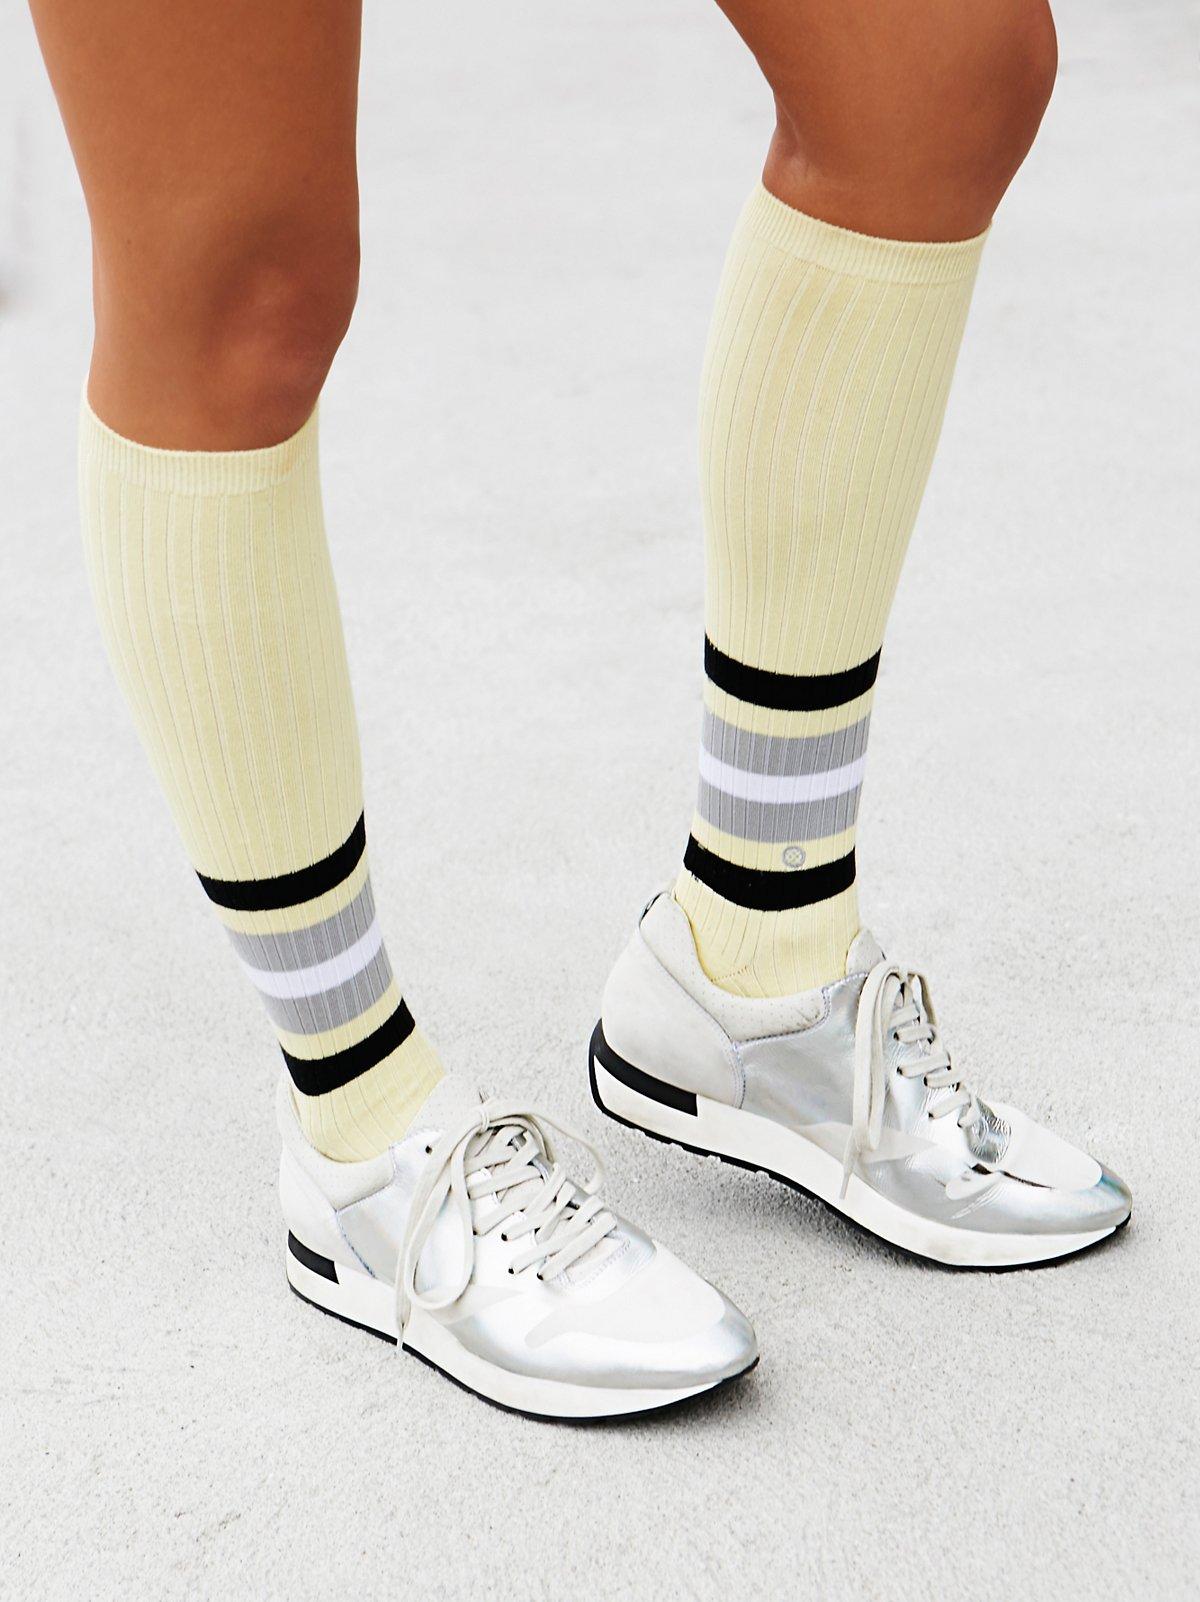 Tip Toe Baby暖腿袜